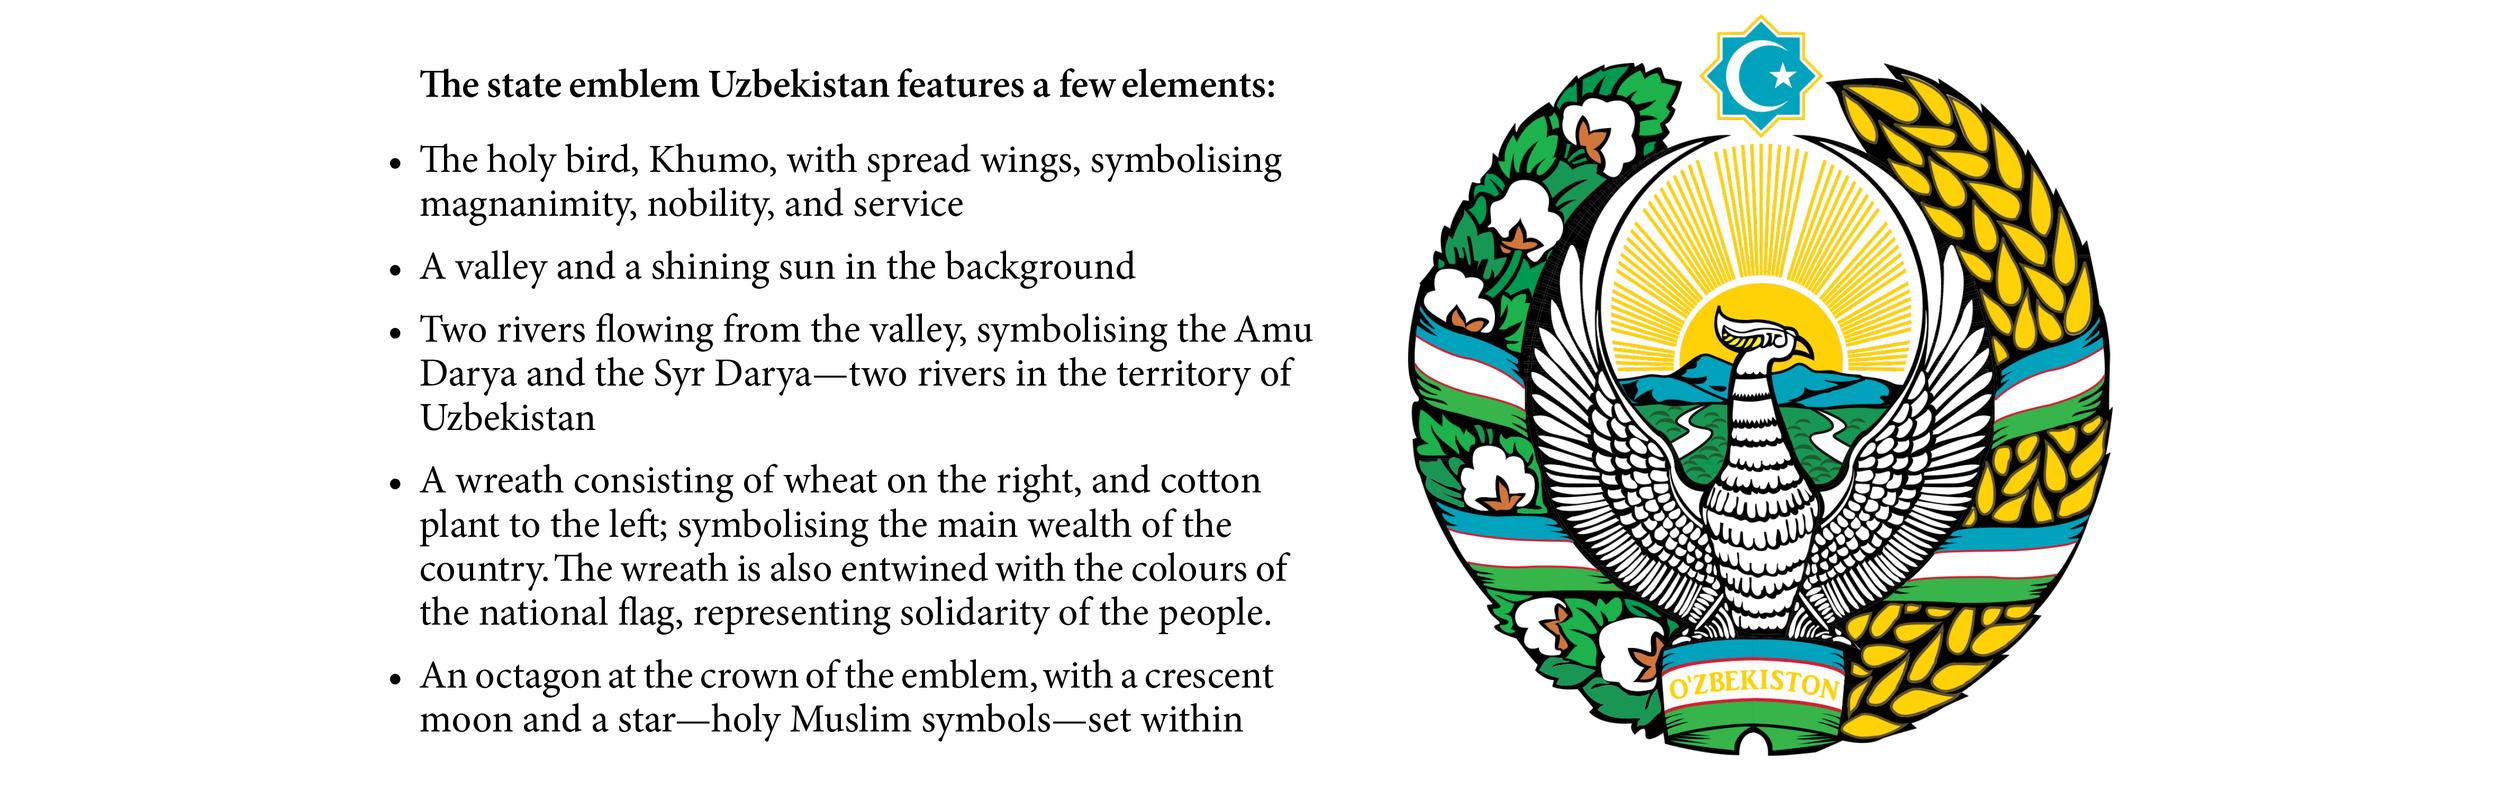 Artwork_State Emblem Uzbekistan_Rationale_small_serif.png